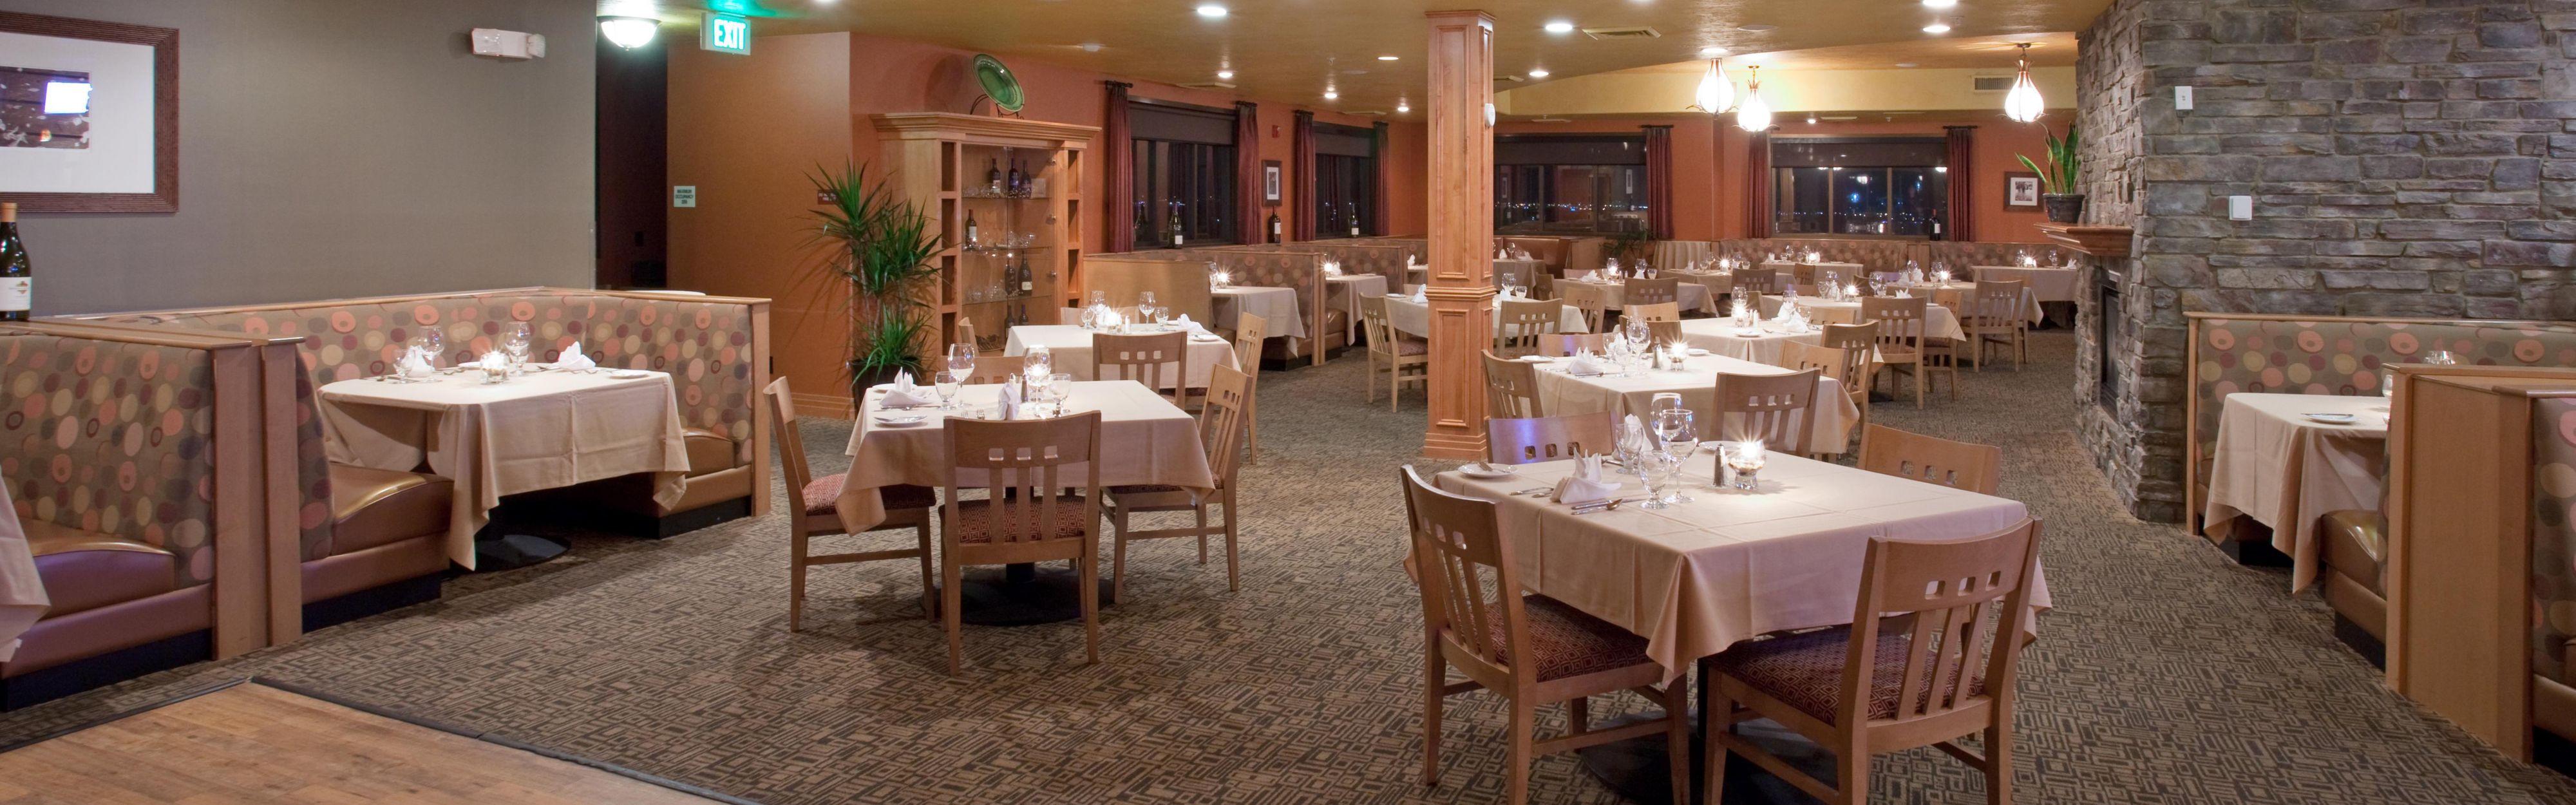 Restaurants near cottonwood mall